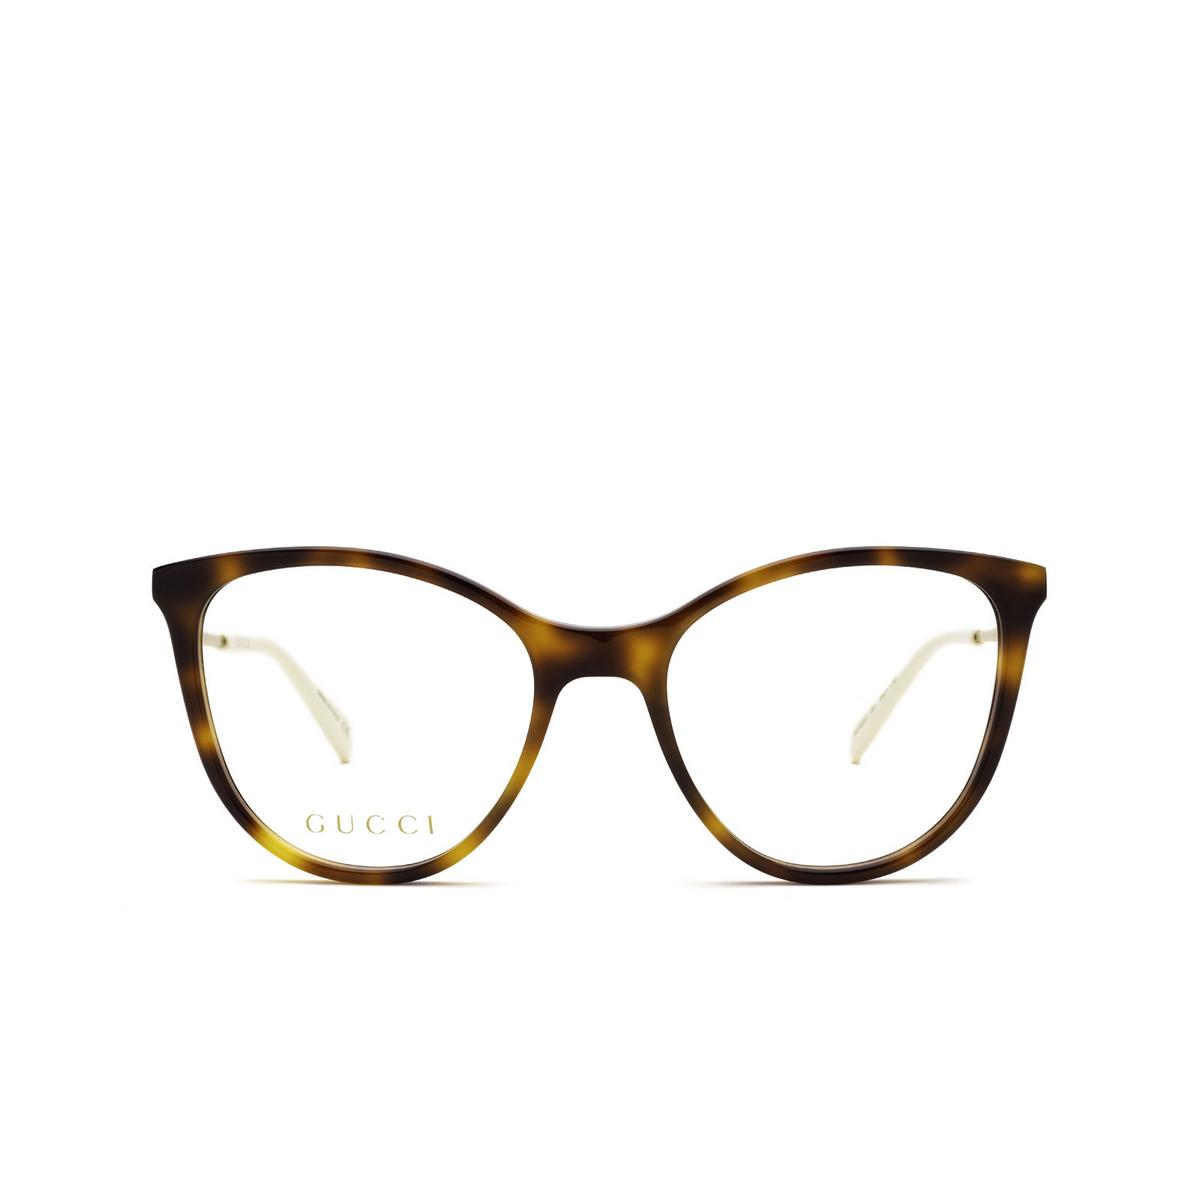 Gucci® Cat-eye Eyeglasses: GG1007O color Havana 001 - front view.